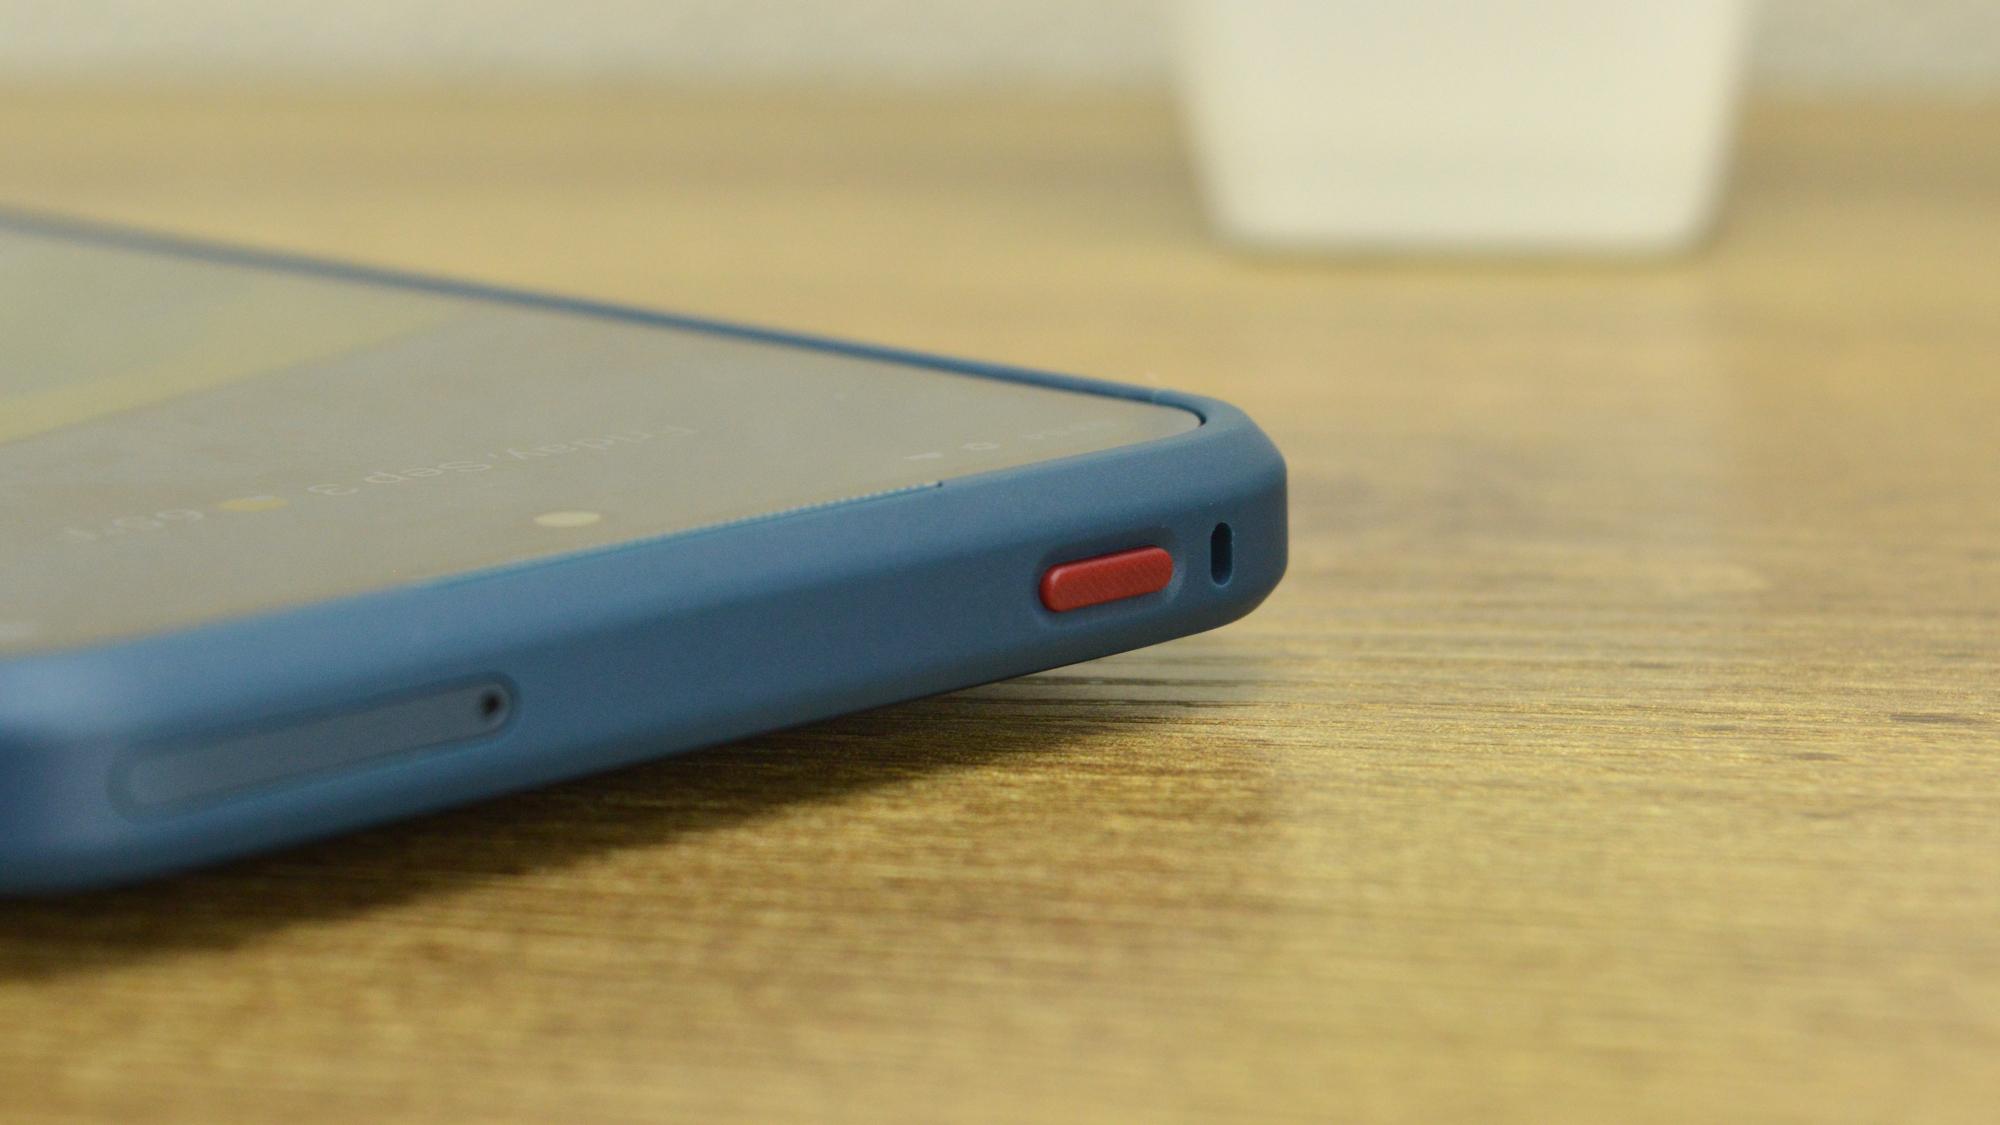 Nokia XR20 Emergency Button